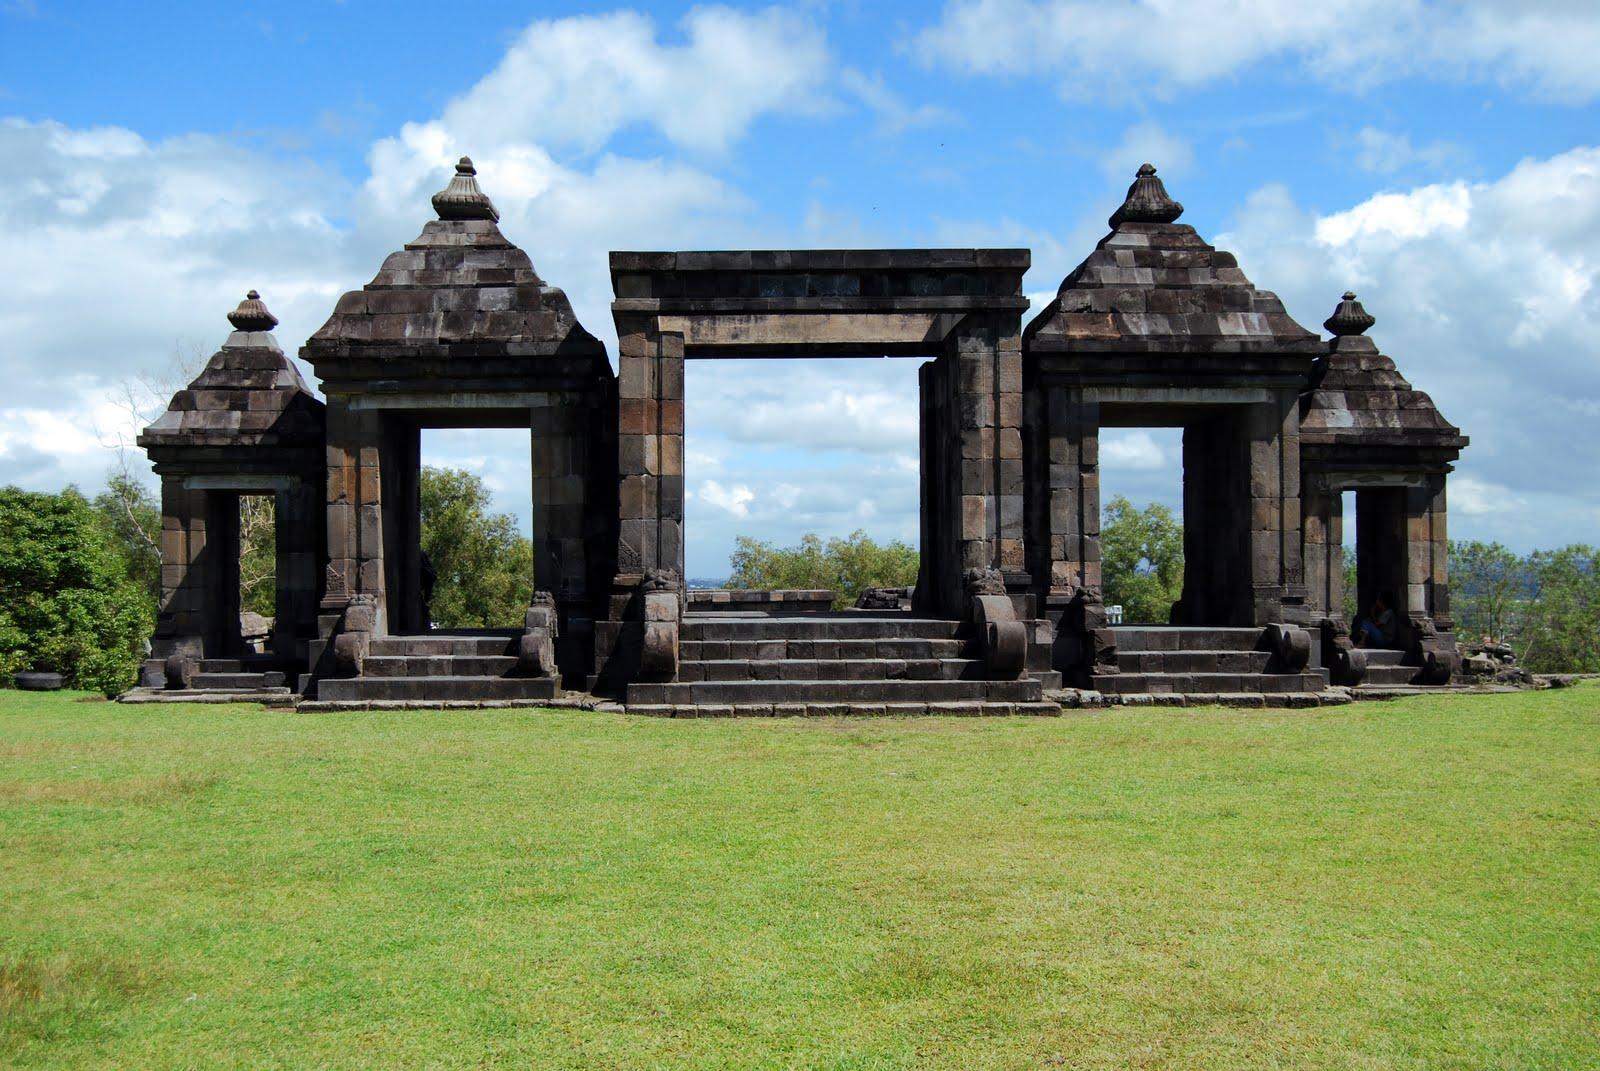 Wisata Candi Ratu Boko Jogja Indahnya Istana Kab Sleman